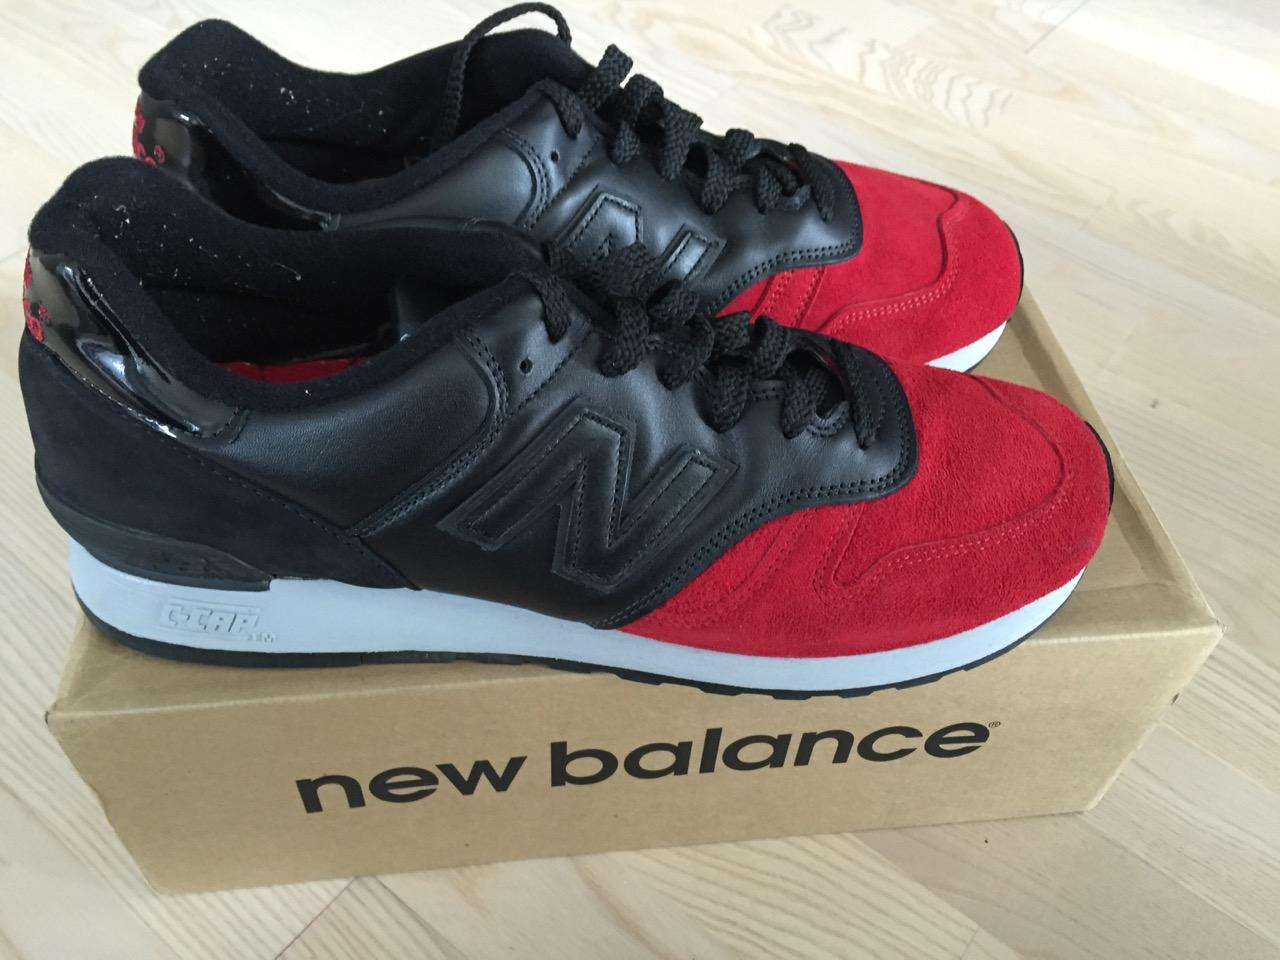 new balance 576 uk all red new balance